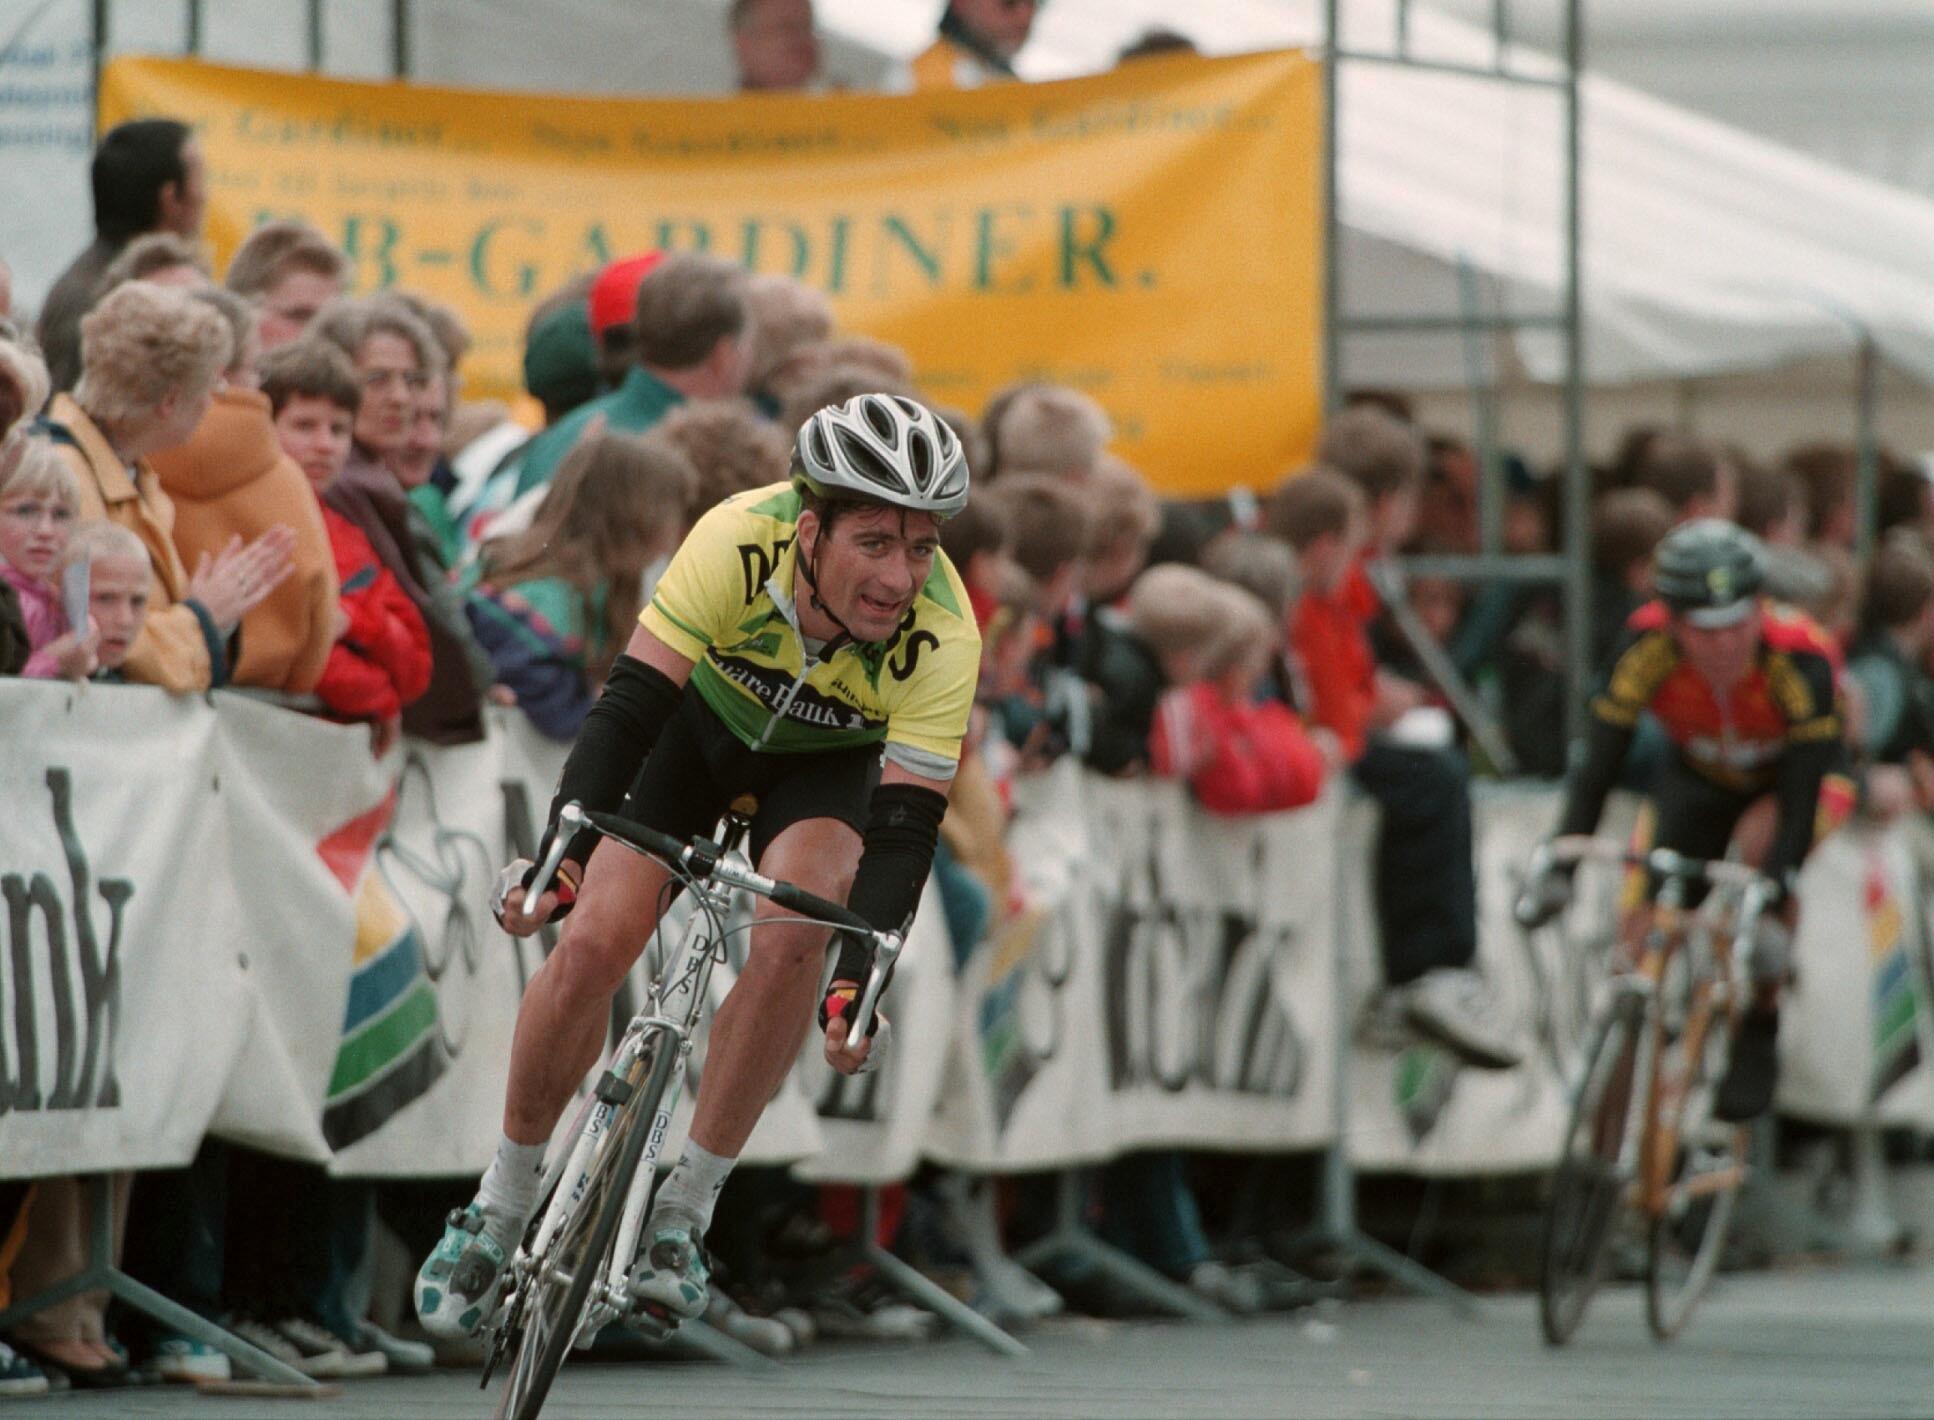 Politiken Herning 11.5.97 Grand Prix Midtbank. Bjørn Stenersen Norge Team Bjørgvin . Scan-Foto/Polfoto: Claus Bonnerup